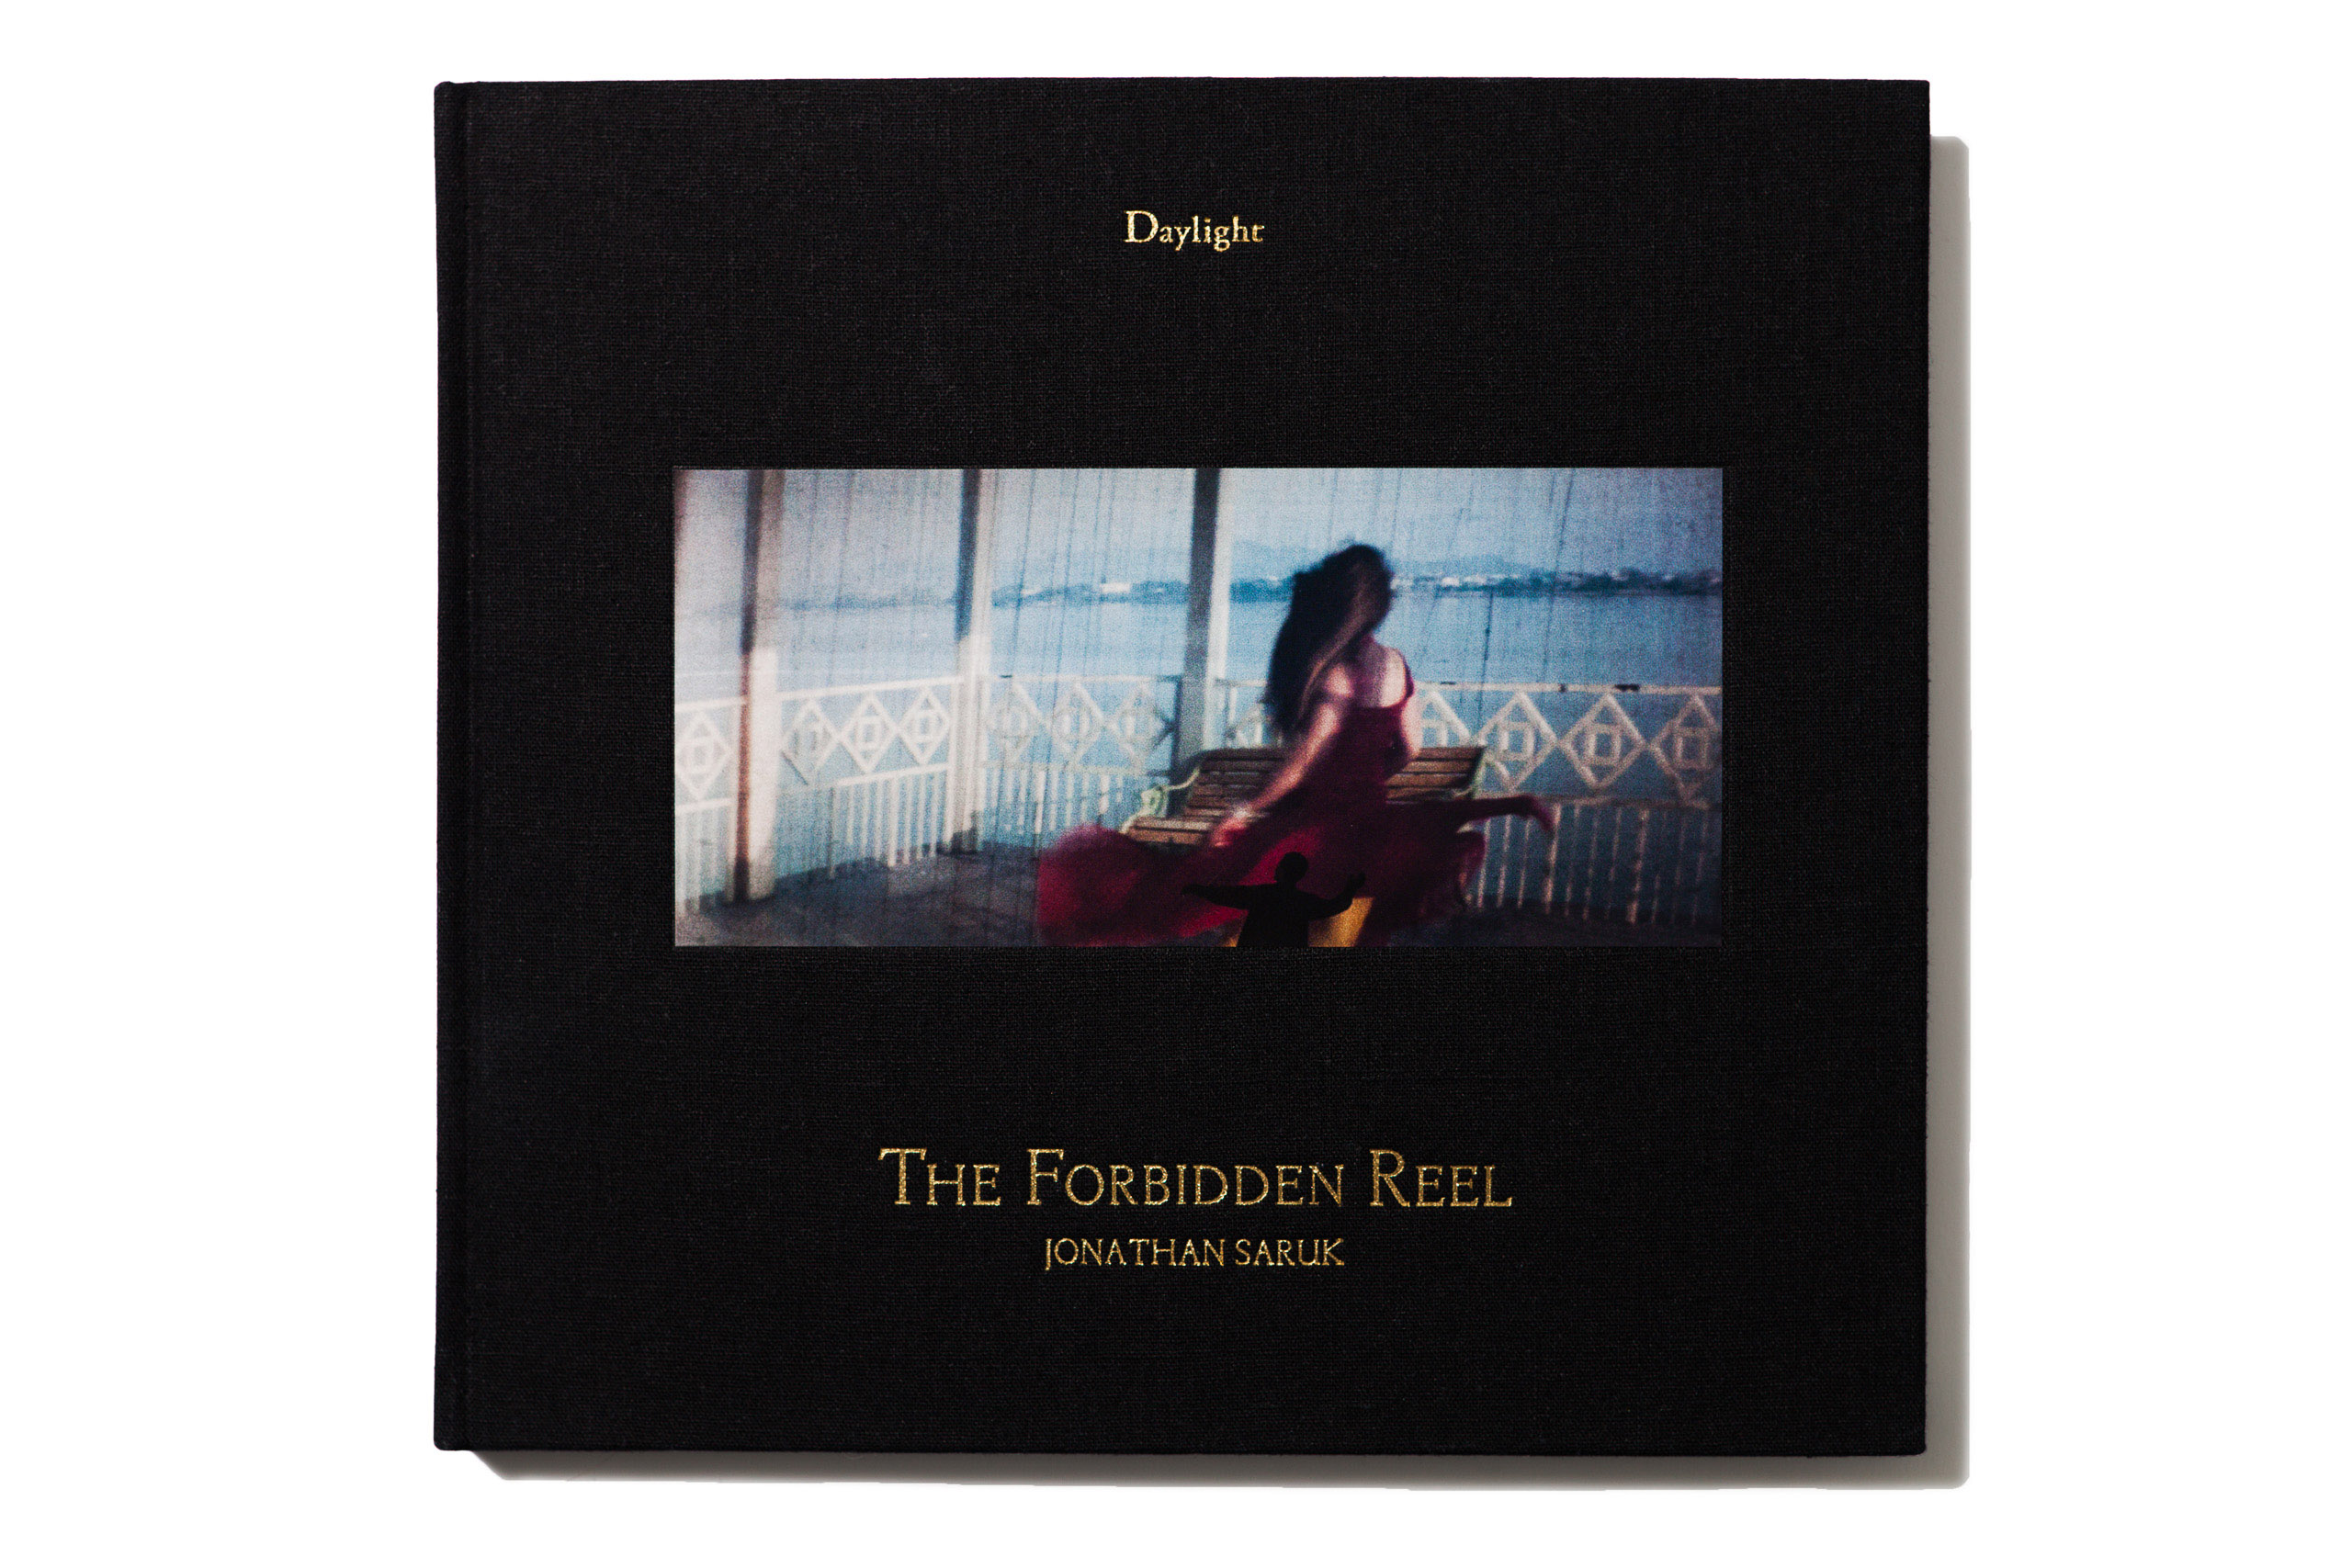 "<a href=""https://daylightbooks.org/store/jonathan-saruk-forbidden-reel""><i><b>The Forbidden Reel</a></i></b> by Jonathan Saruk, published by Daylight Books, selected by Marisa Schwartz, Associate Photo Editor, <i>TIME.com</i>."